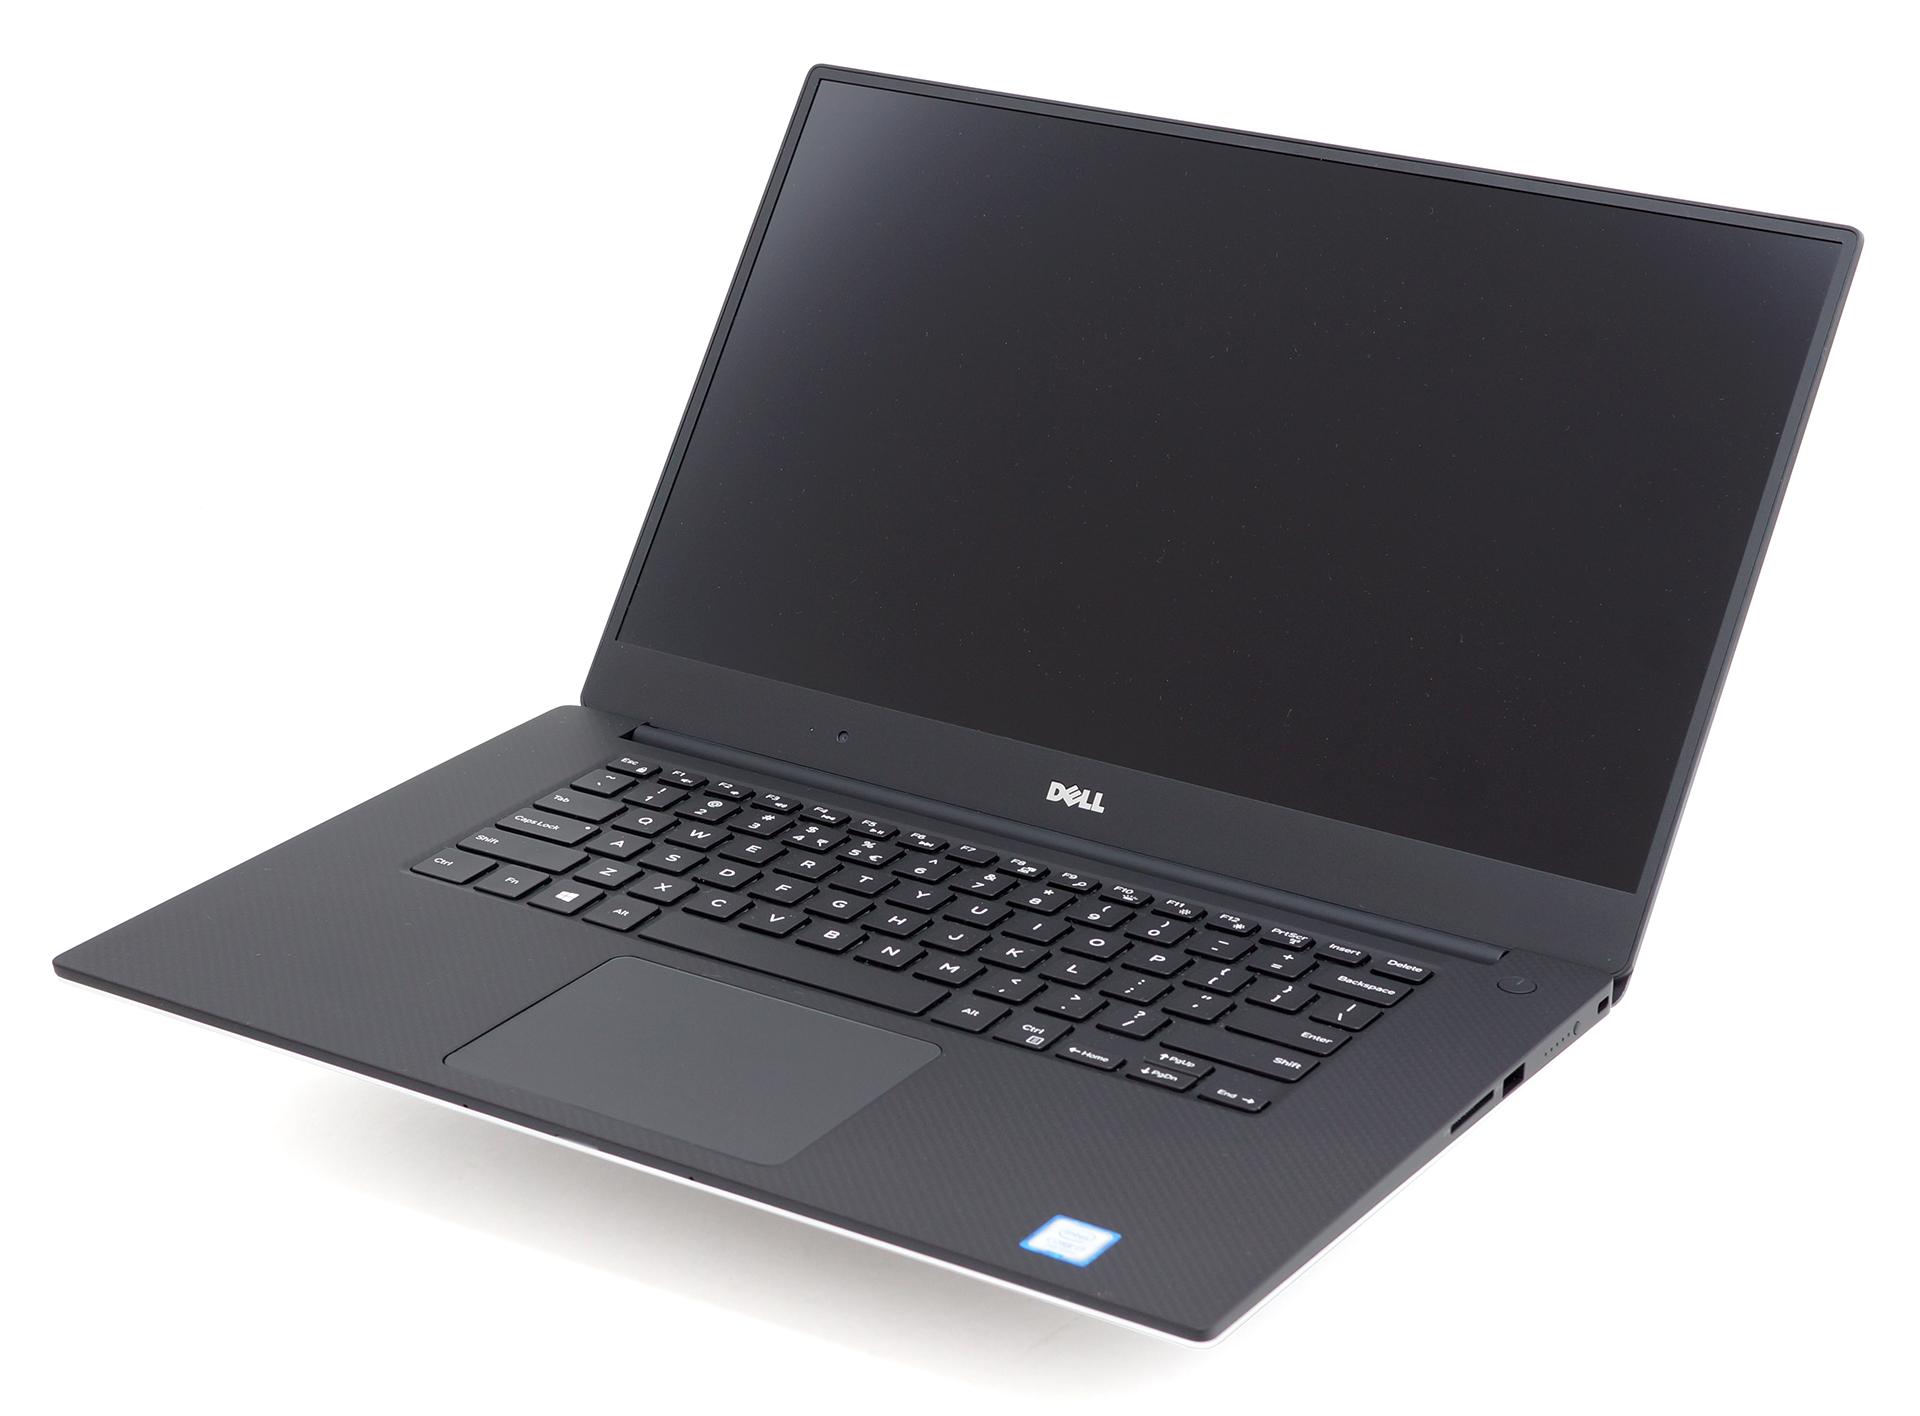 Dell inspiron 5520 specs